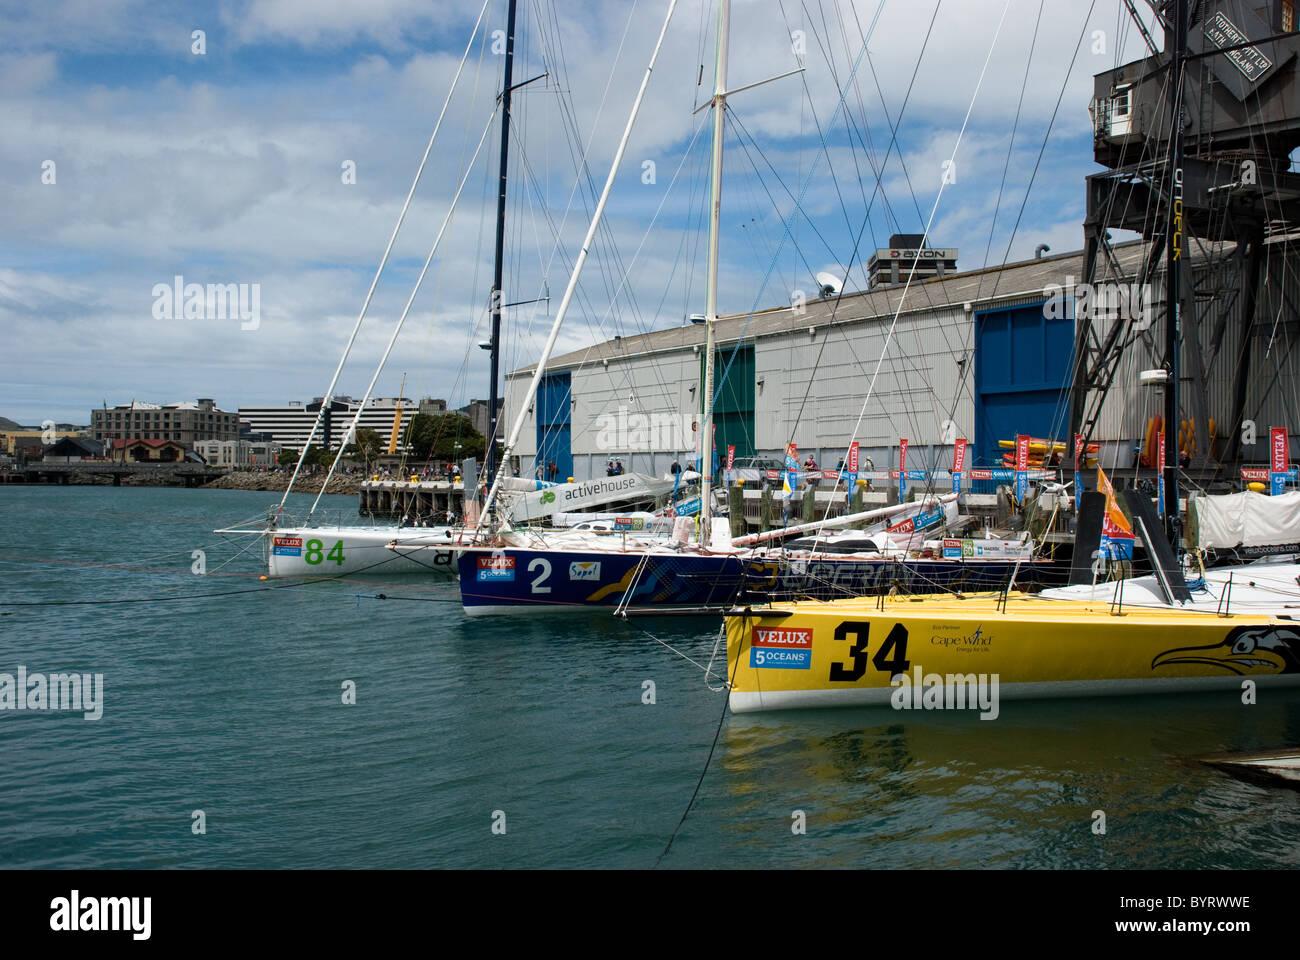 The Velux 5 Oceans Yacht Race Arrives in Wellington, Queen Wharf, Wellington, New Zealand - Stock Image